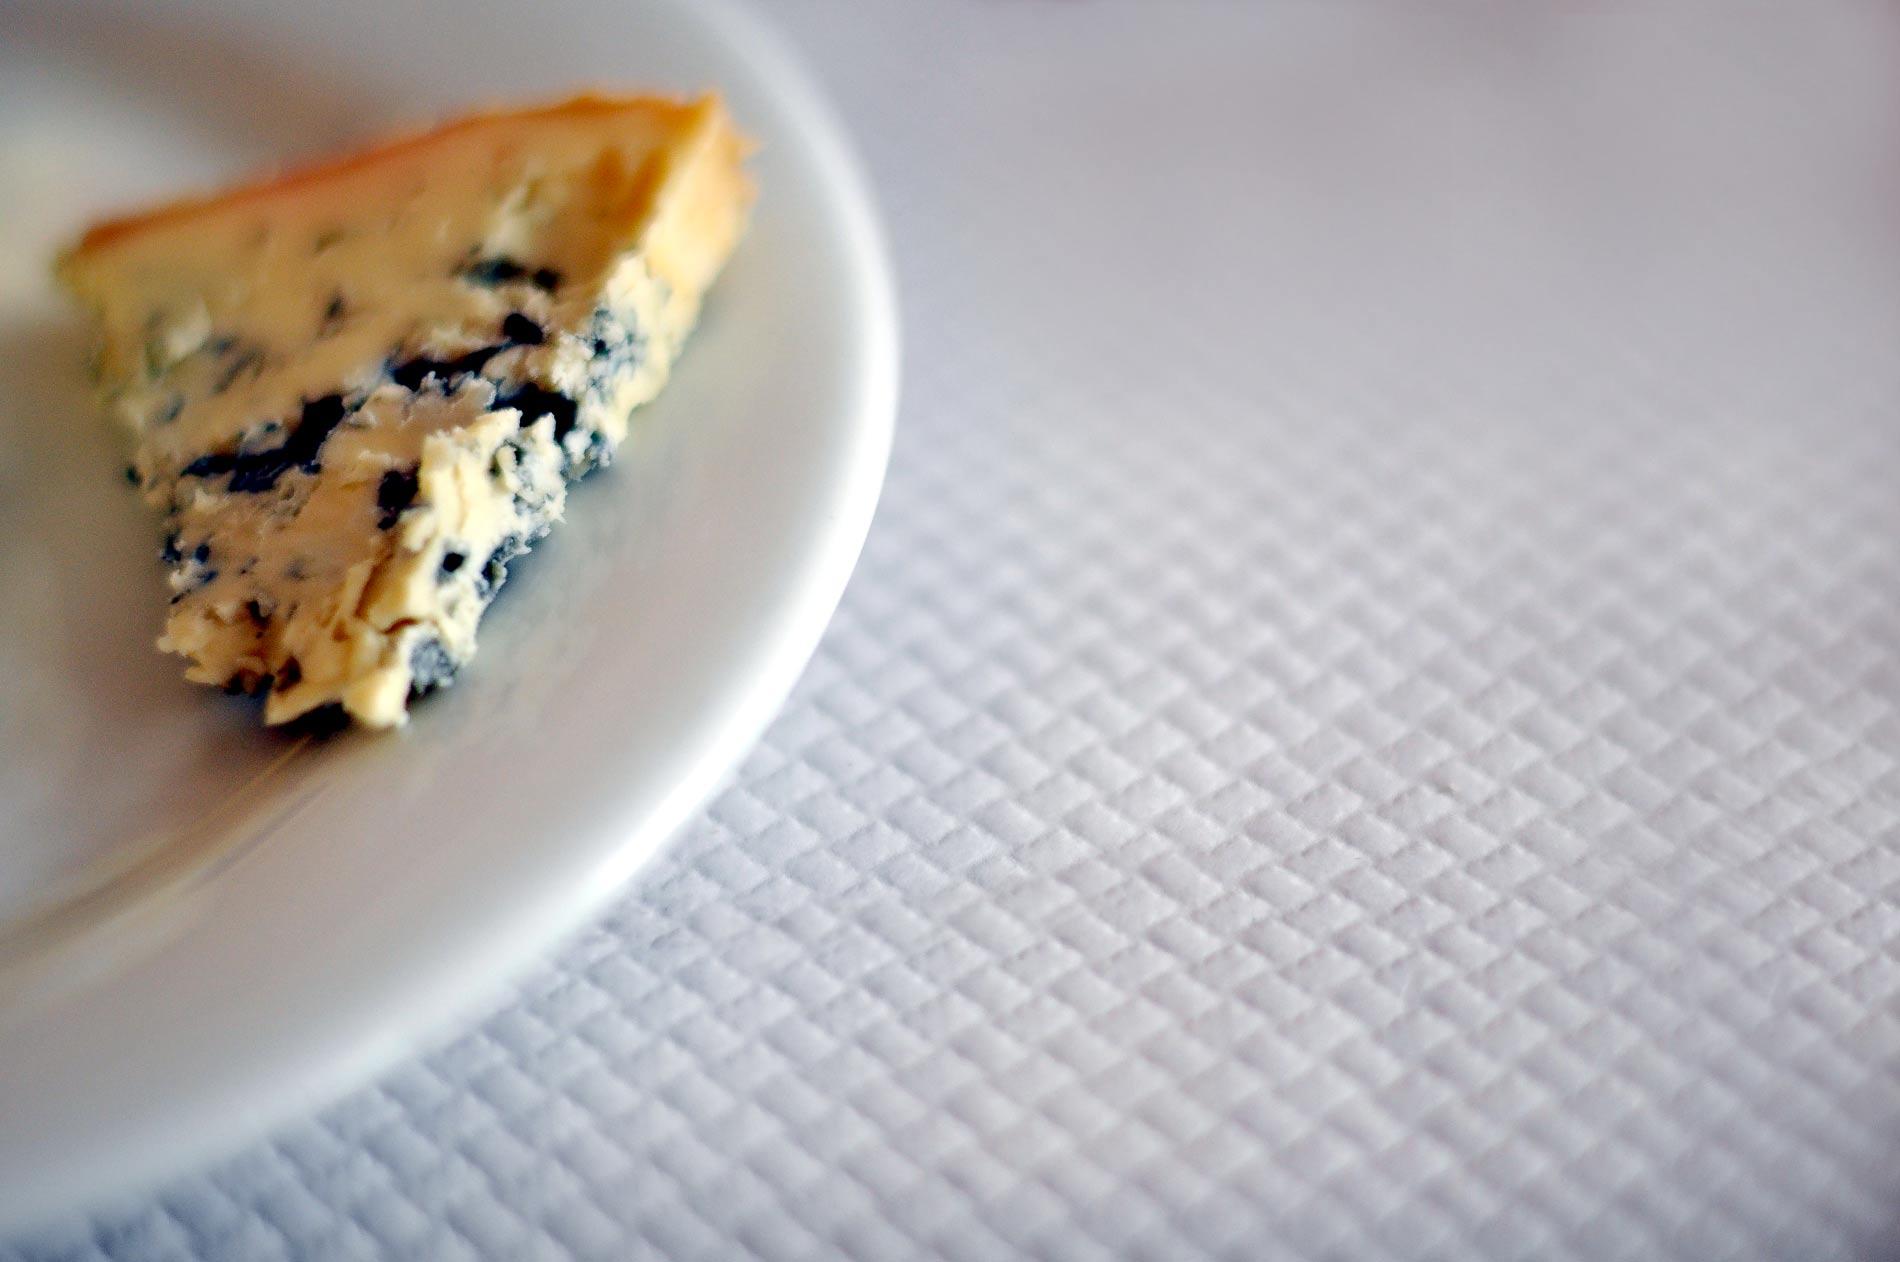 Alimentos fermentados, la técnica milenaria sigue de moda